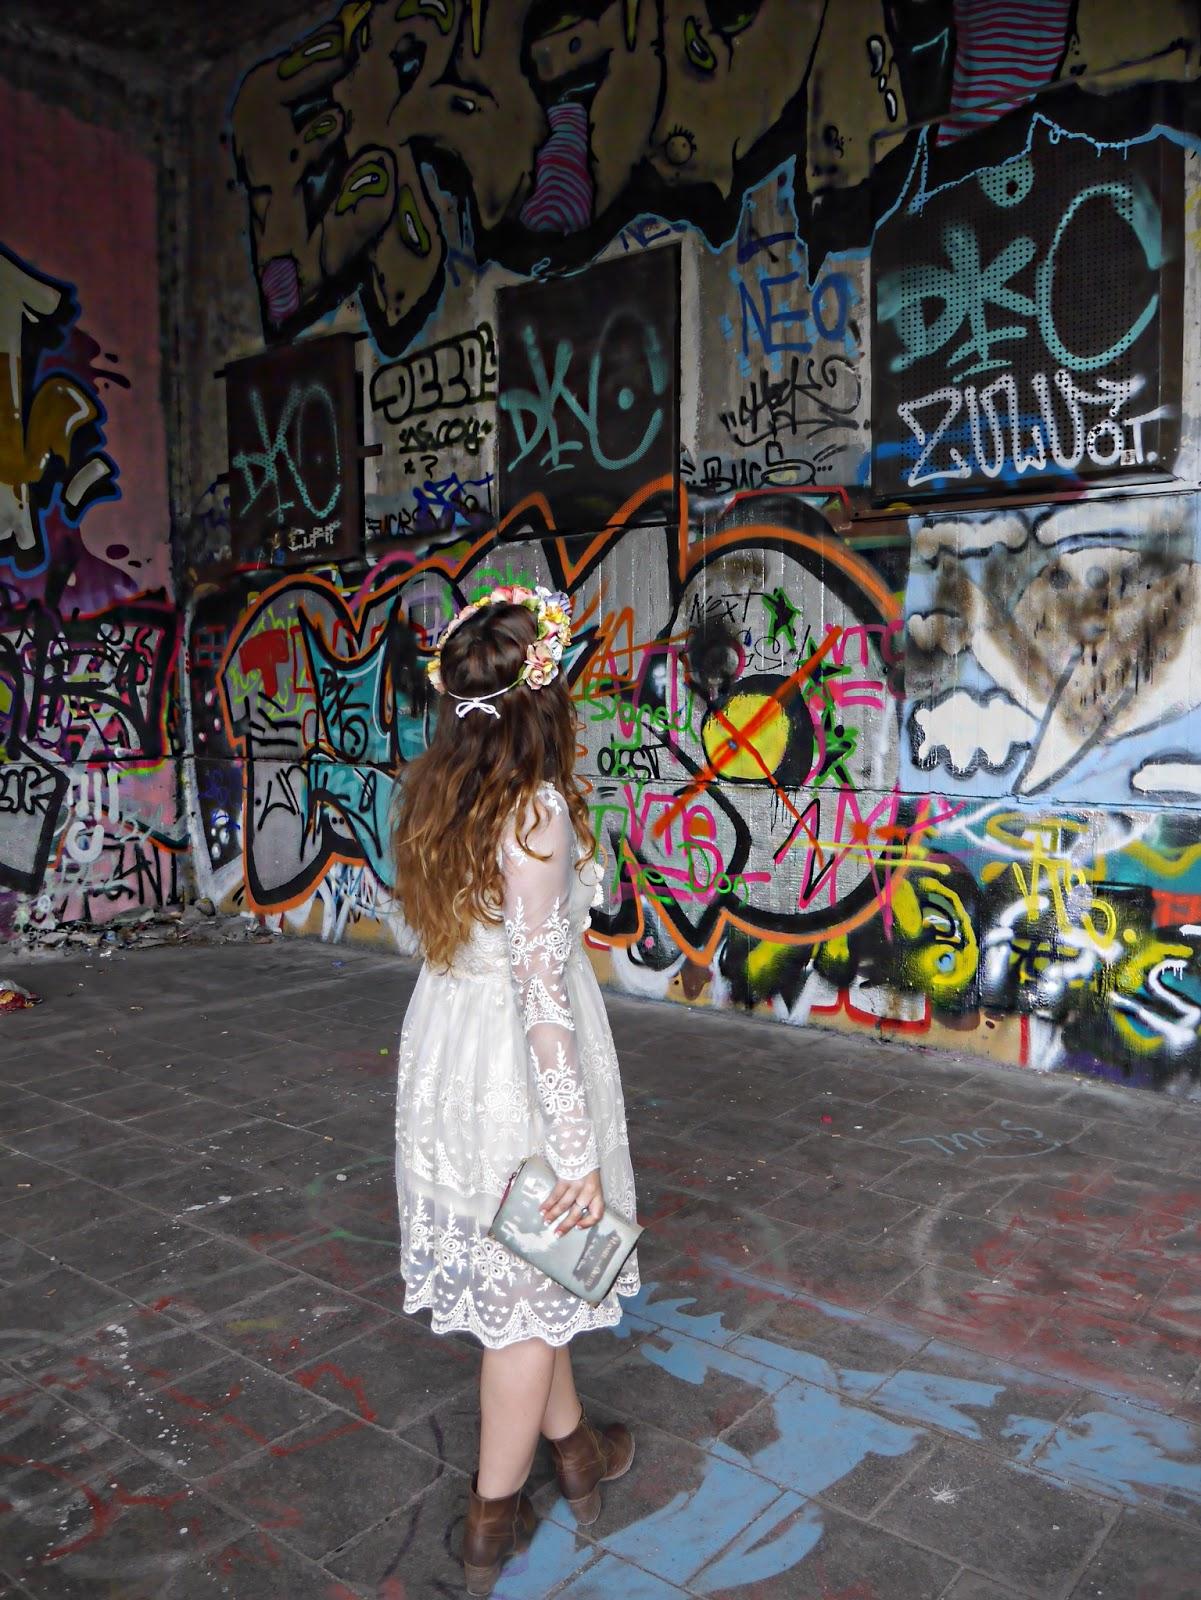 Street Style, fashion blogger, egoblogger, De mayor quiero ser egoblogger, blogger moda, boho lace dress, vestido encaje boho, corona flores, floral headband, clutch libro, book clutch, Olympiazentrum S-Bahn, Olympiazentrum Geisterbahnhof